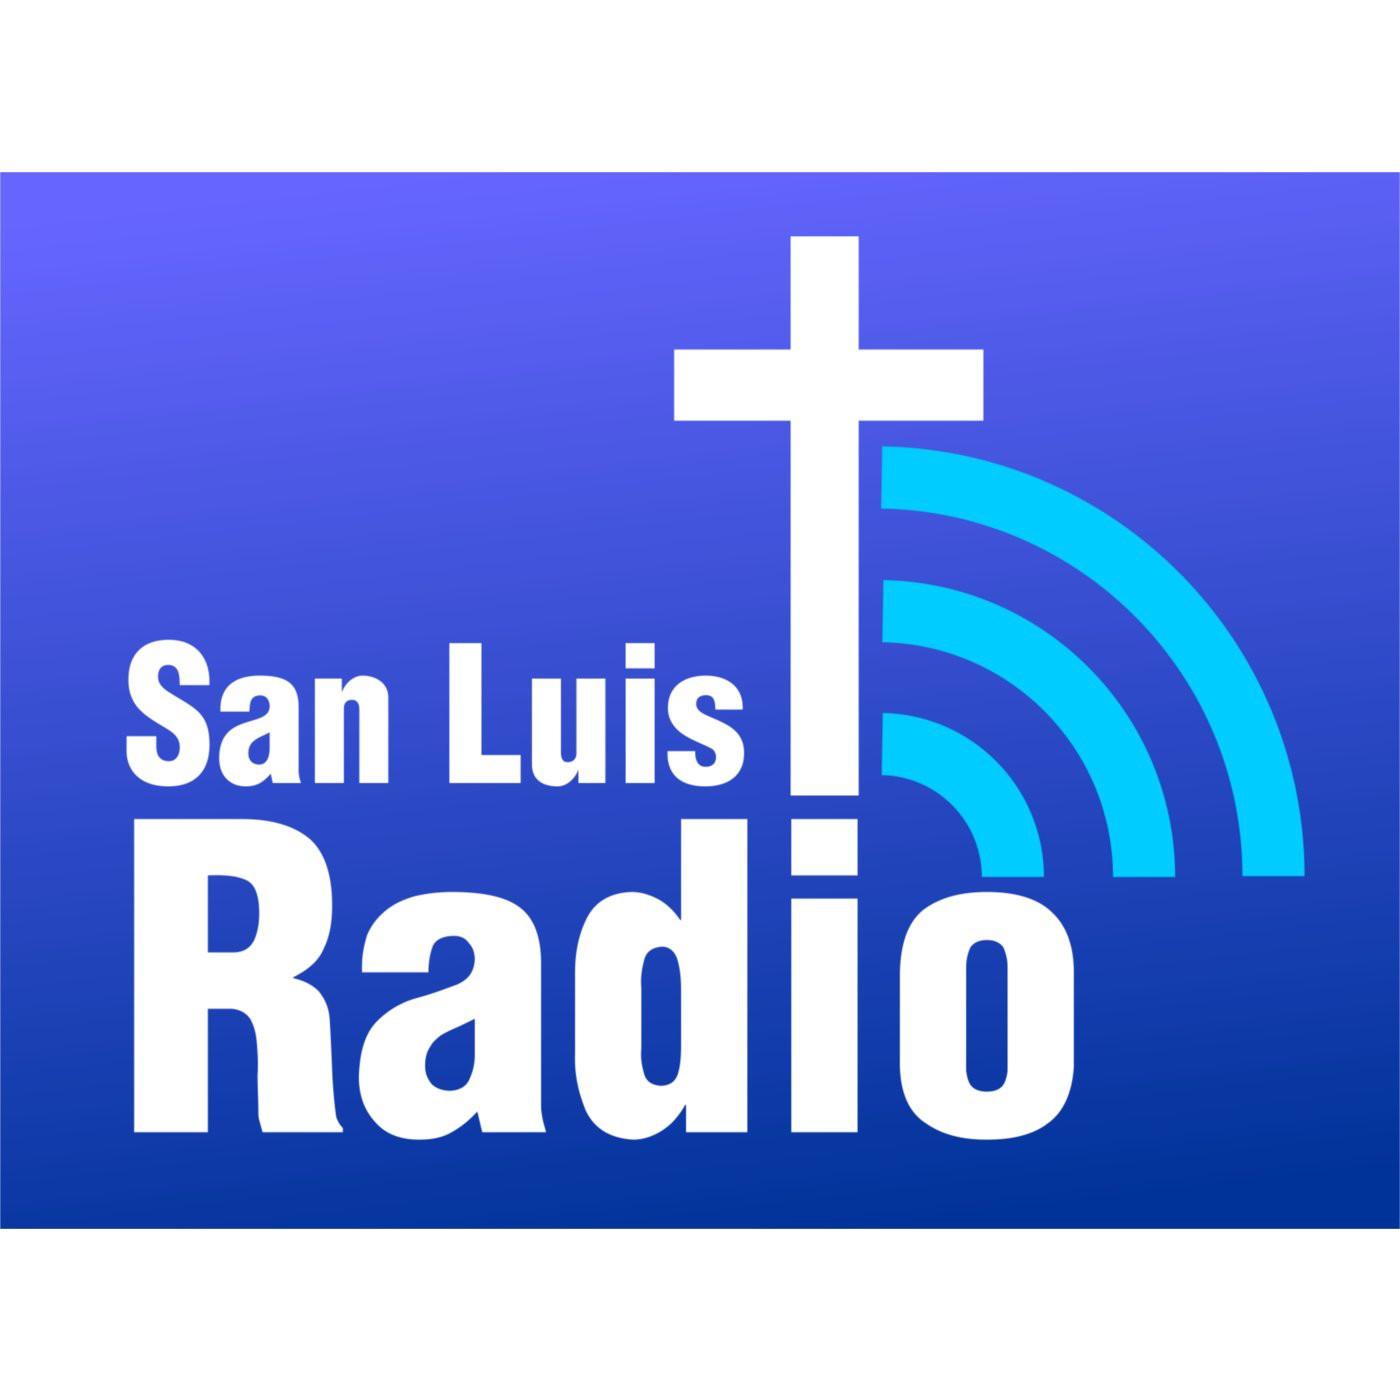 San Luis Radio - Huamantla Tlax.